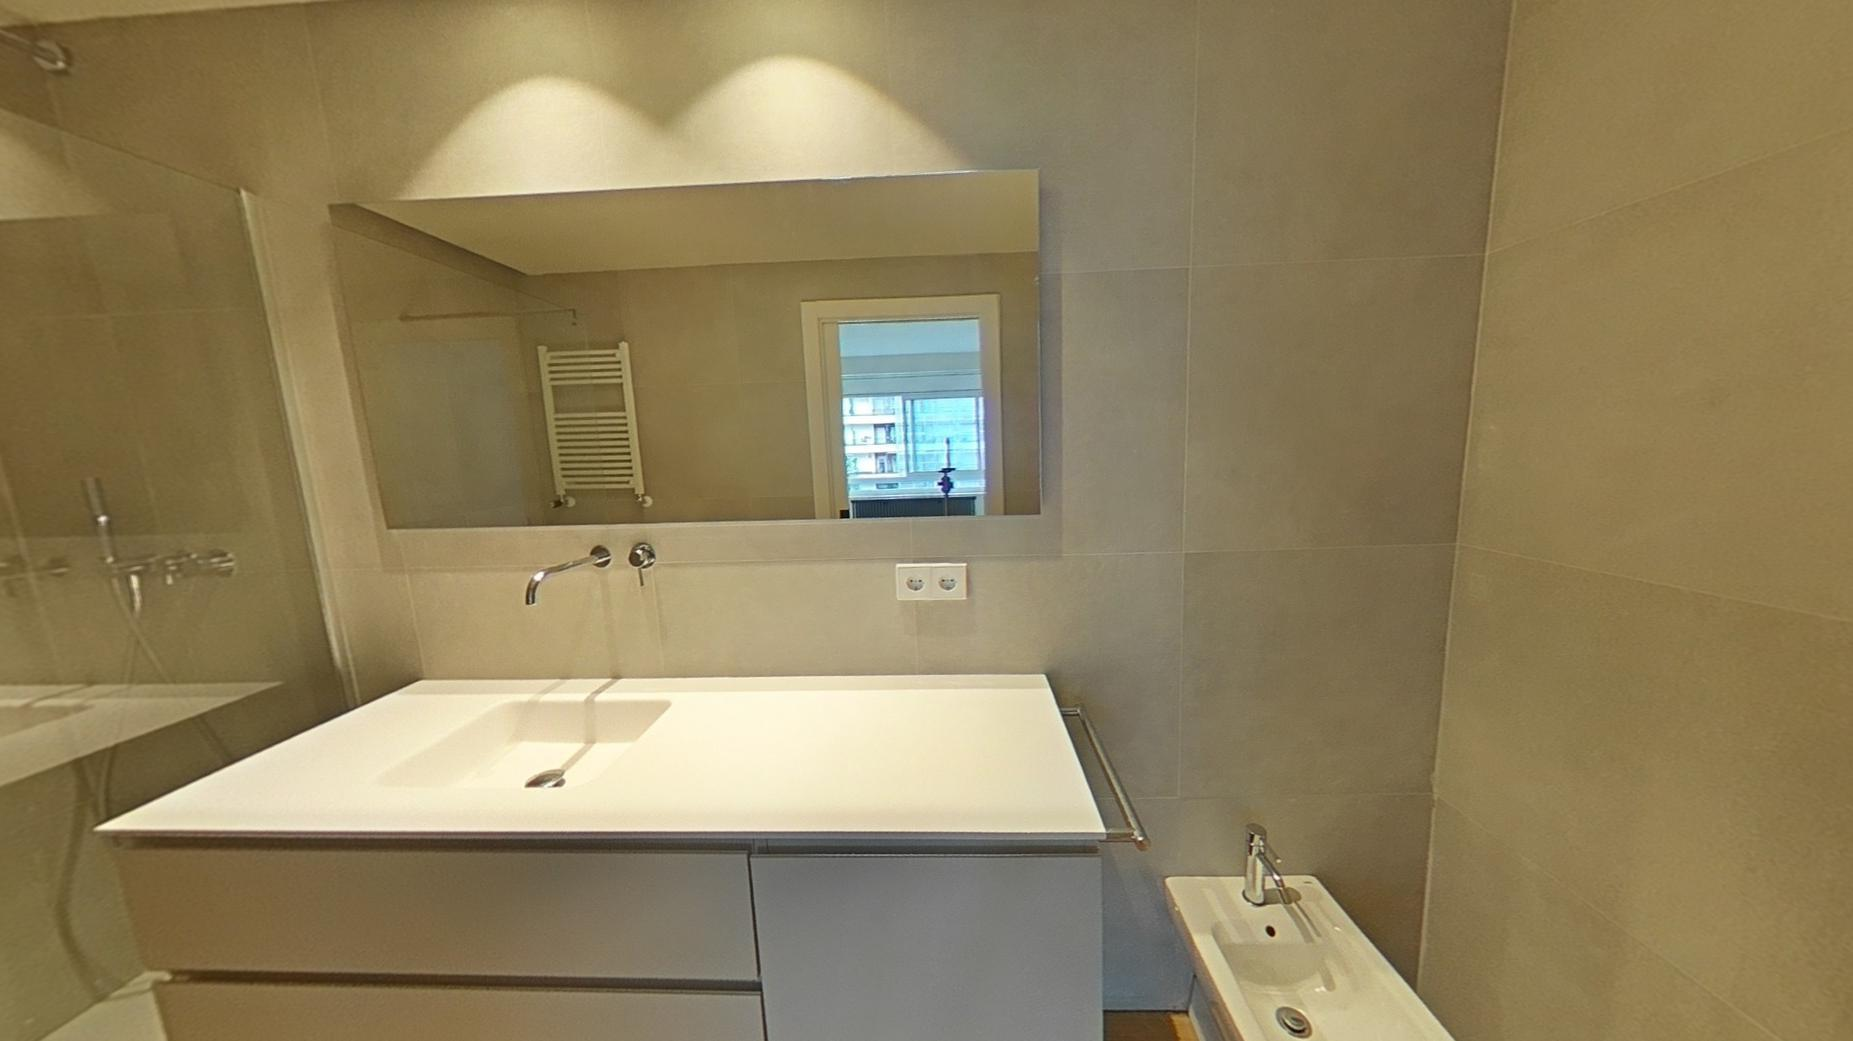 253492 Flat for sale in Sarrià-Sant Gervasi, Sant Gervasi-Galvany 28